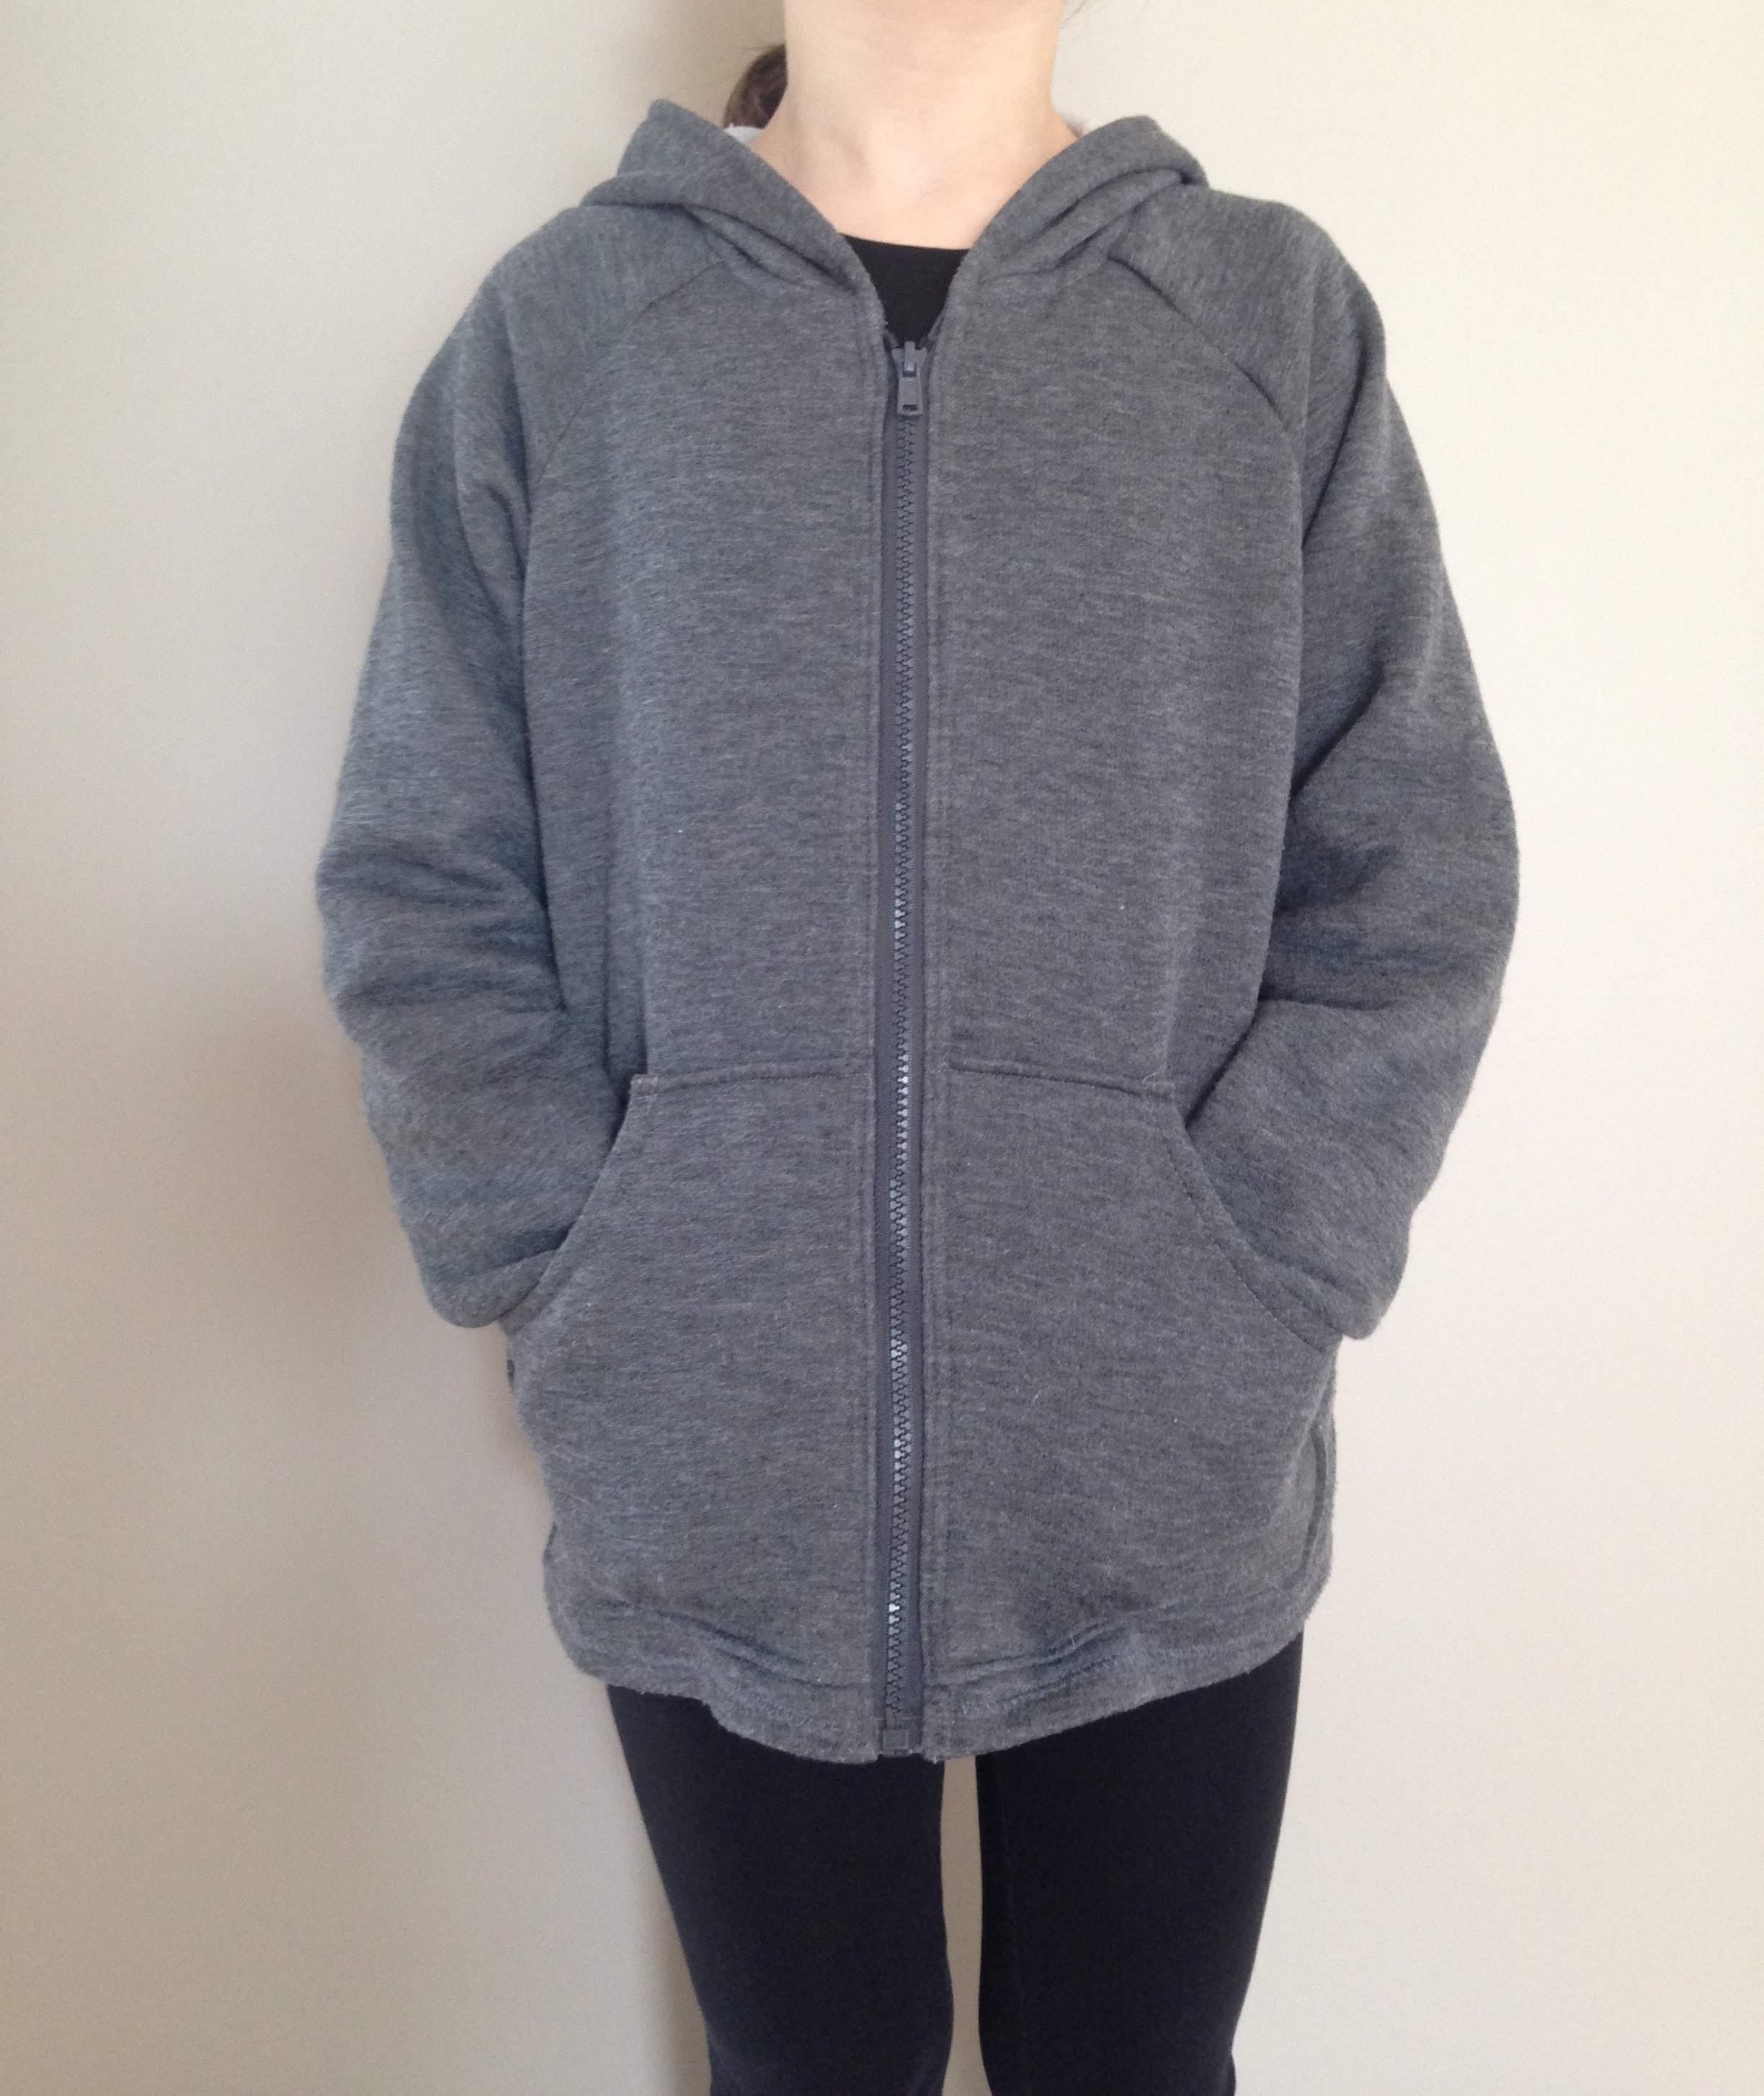 La veste de printemps / Sweater